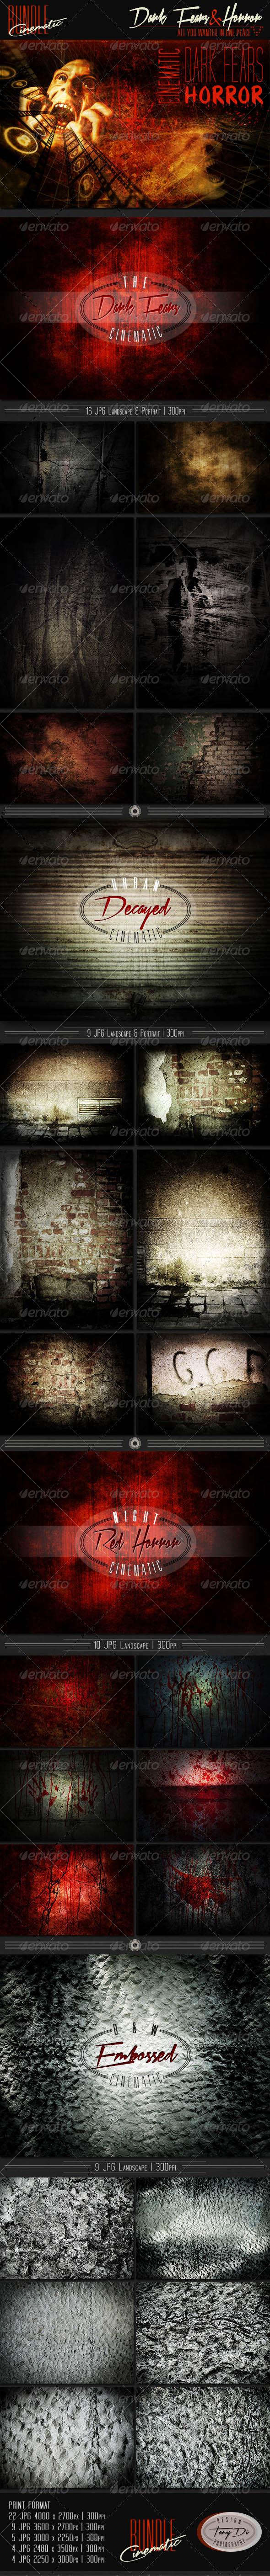 GraphicRiver Dark Fears & Horror Cinematic Bundle 6977536